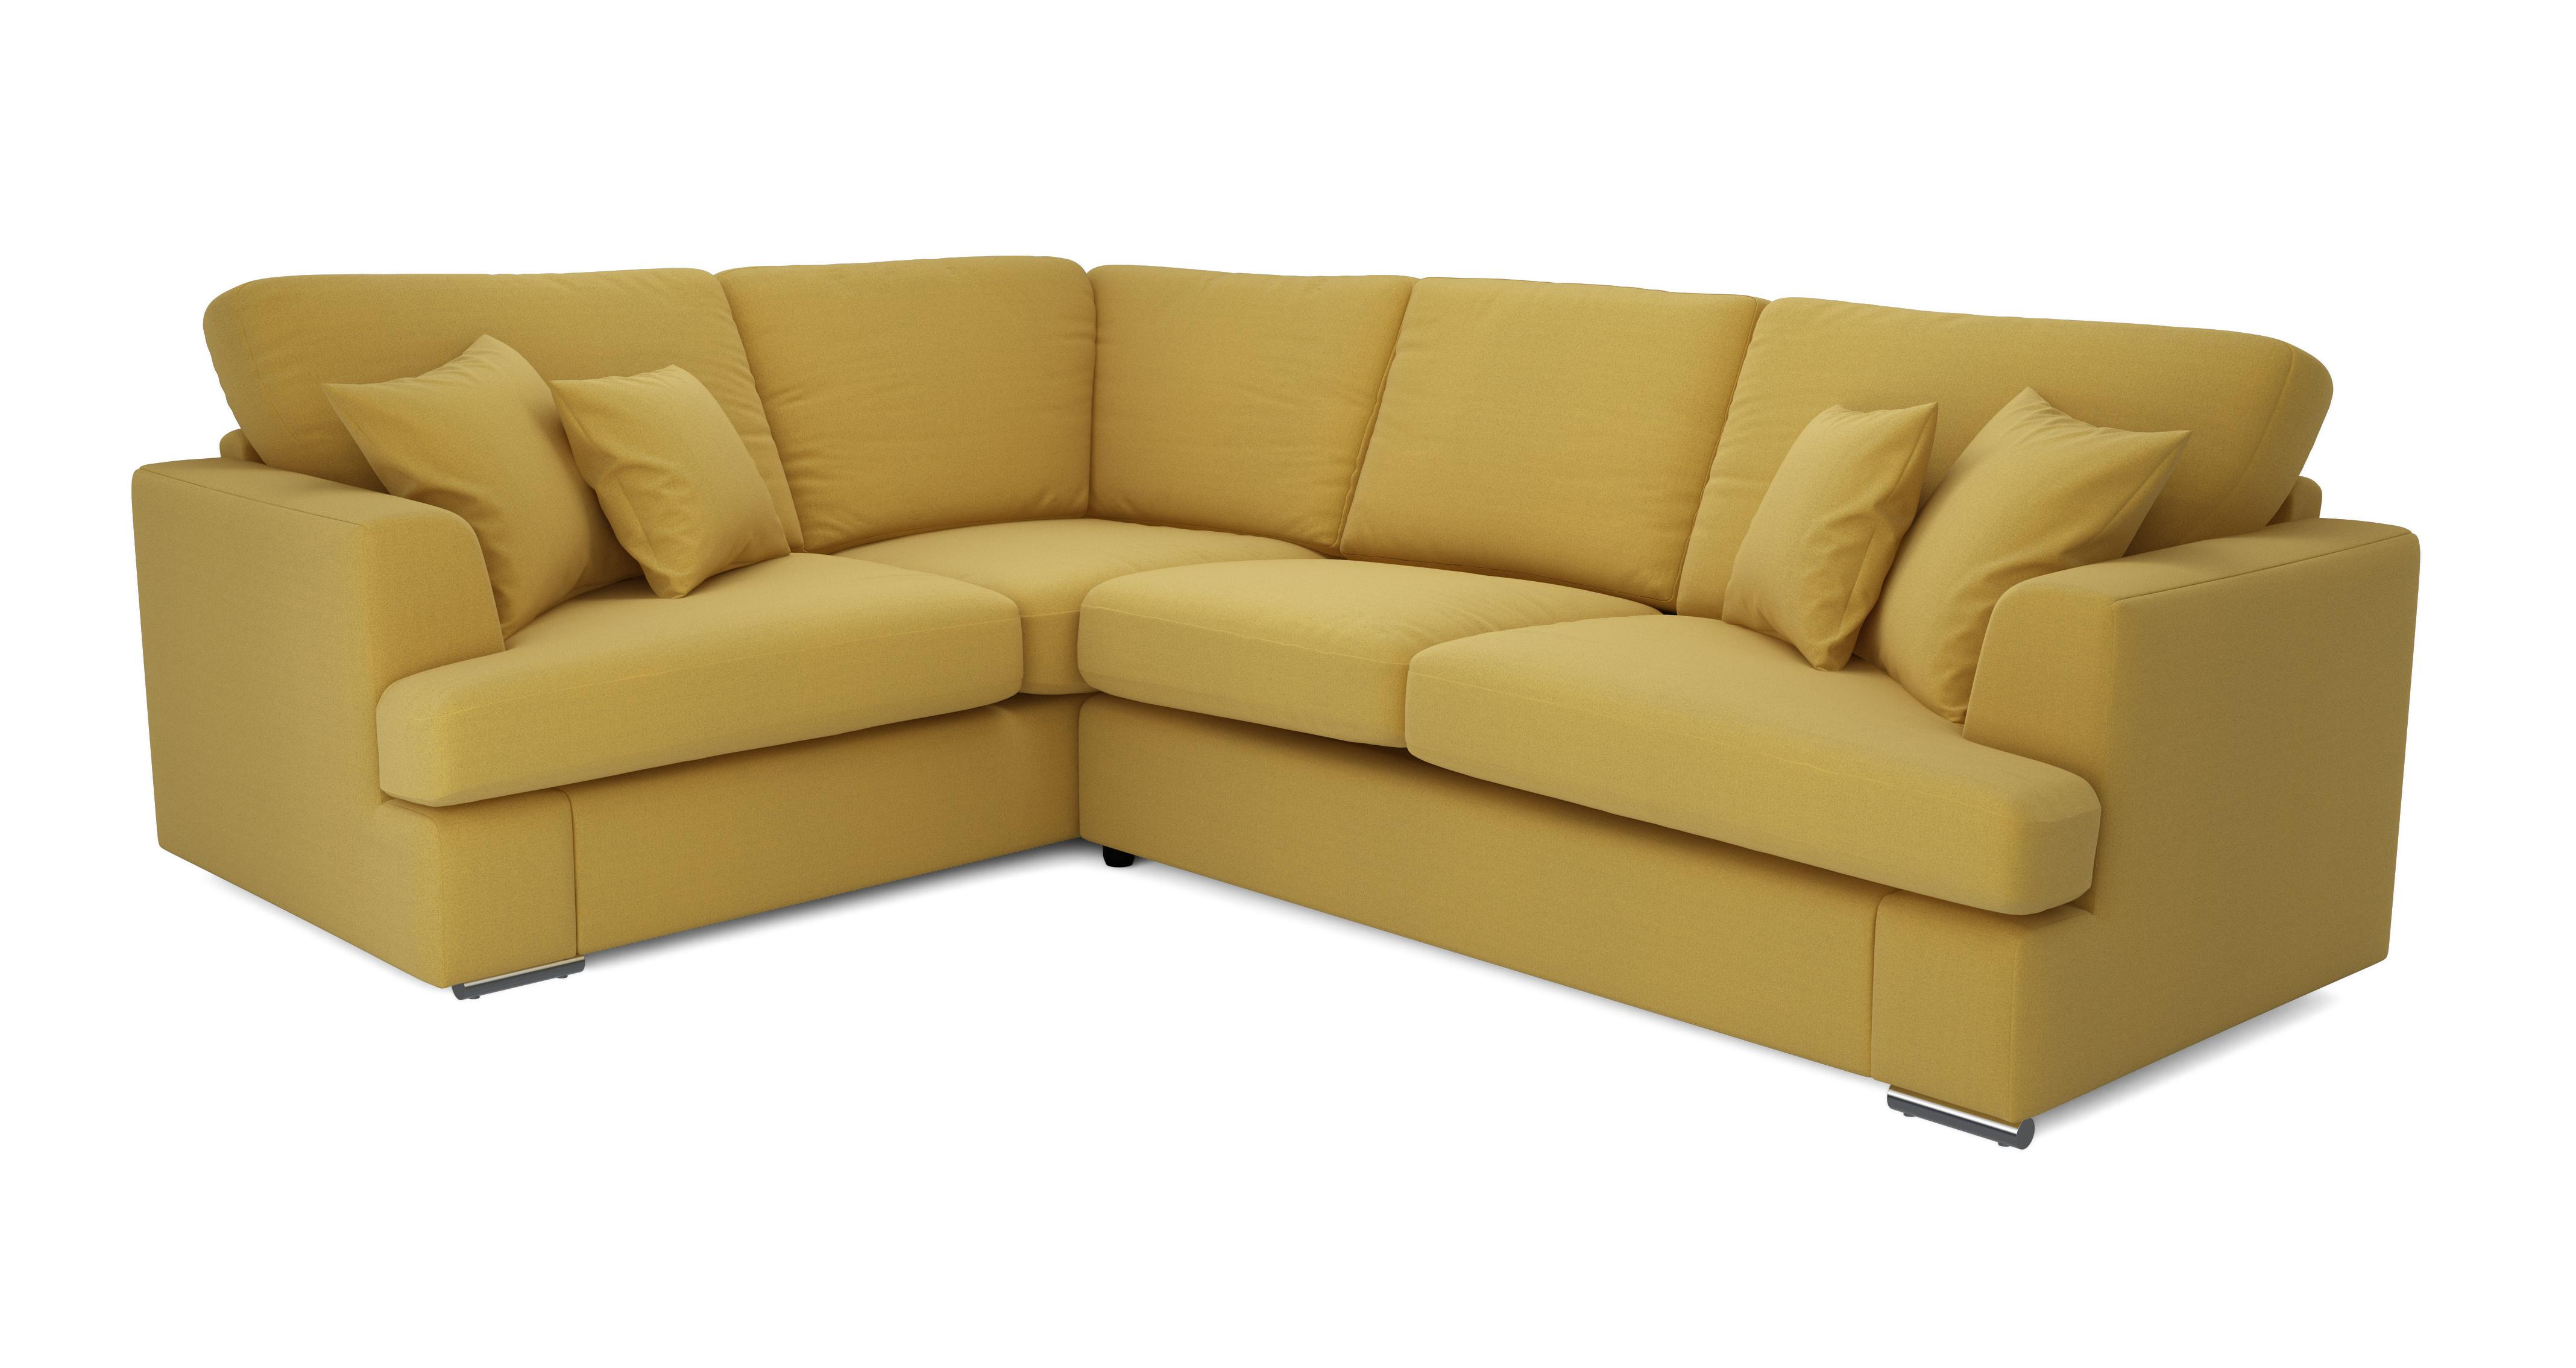 Swell Freya Right Hand Facing 2 Piece Corner Deluxe Sofa Bed Machost Co Dining Chair Design Ideas Machostcouk